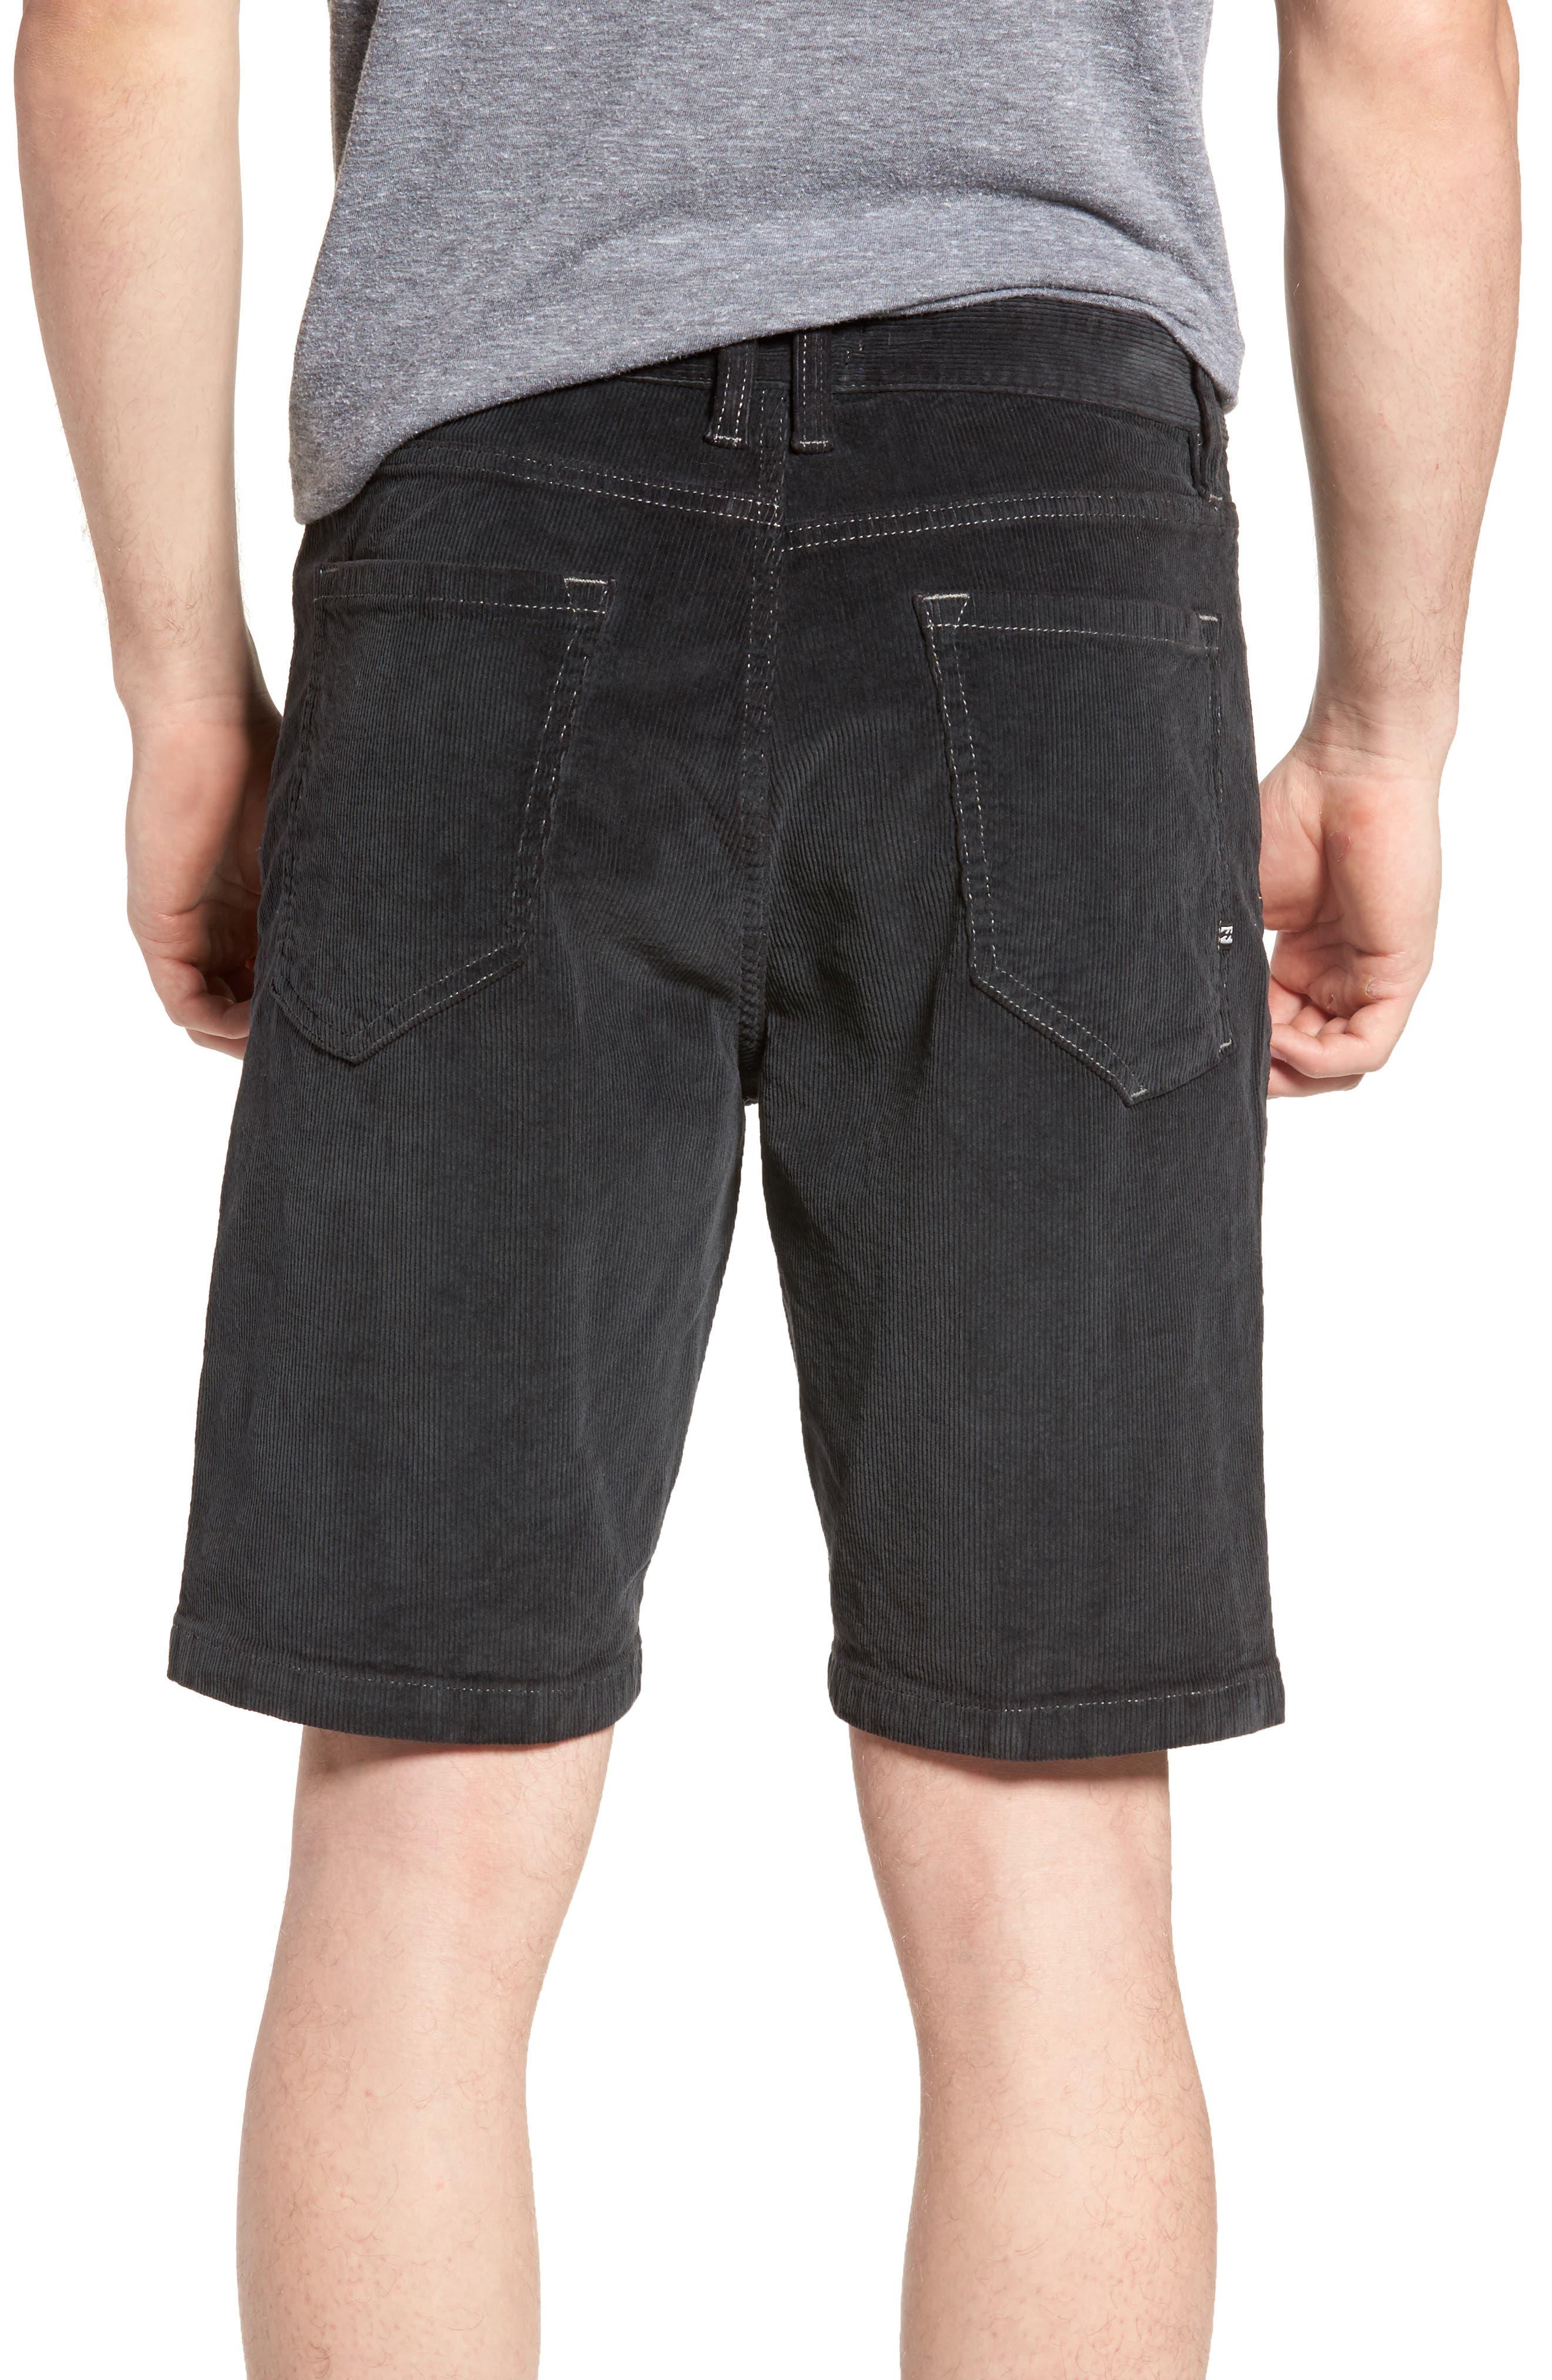 Outsider Corduroy Shorts,                             Alternate thumbnail 2, color,                             010